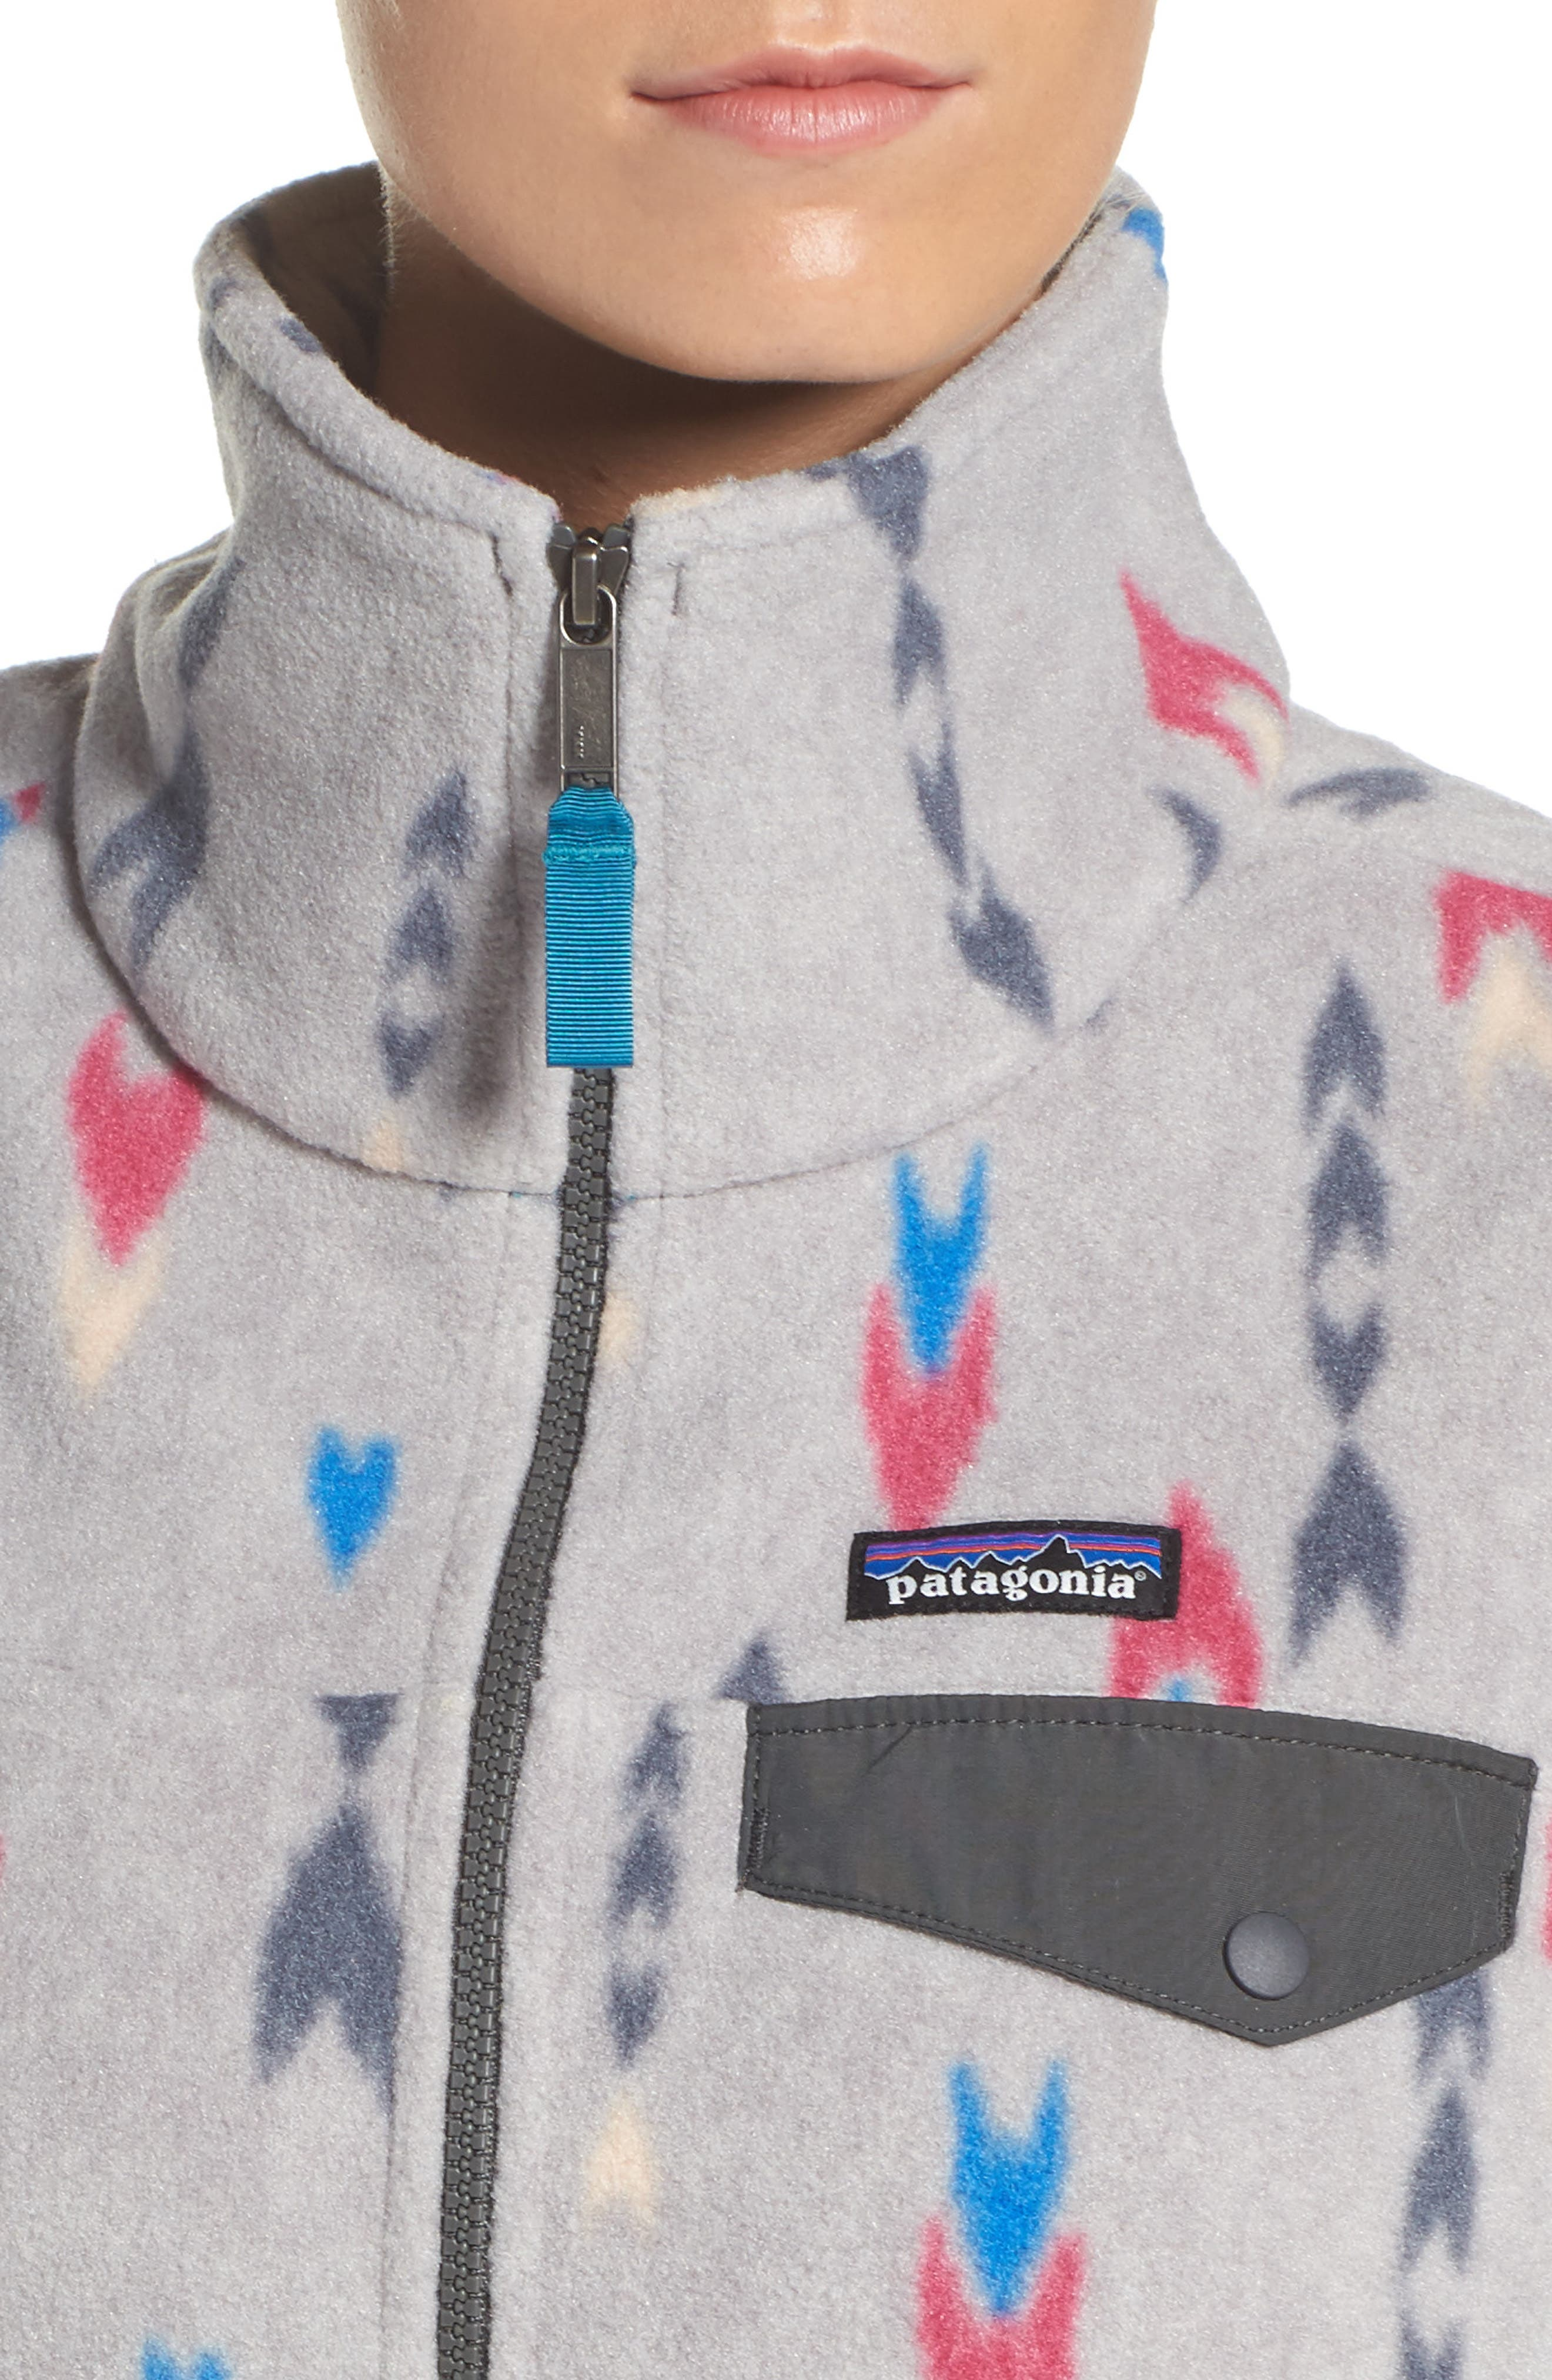 Snap-T<sup>®</sup> Fleece Vest,                             Alternate thumbnail 4, color,                             Wish Tails Big/ Craft Pink